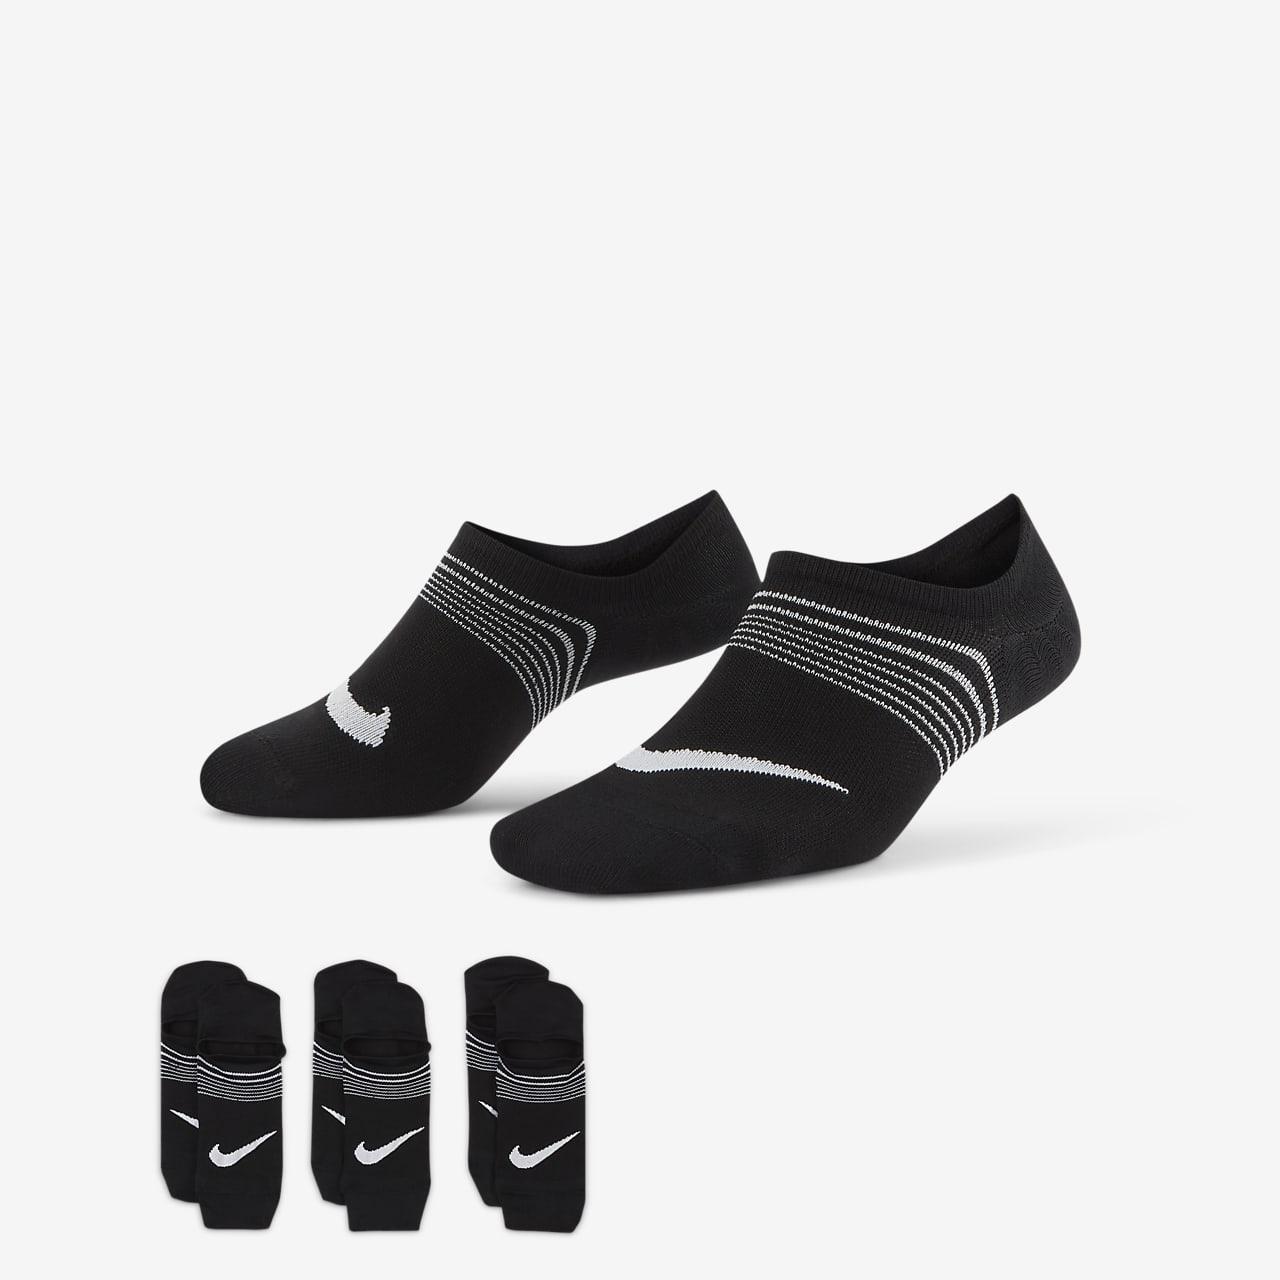 Skarpety treningowe Nike Lightweight (3 pary)